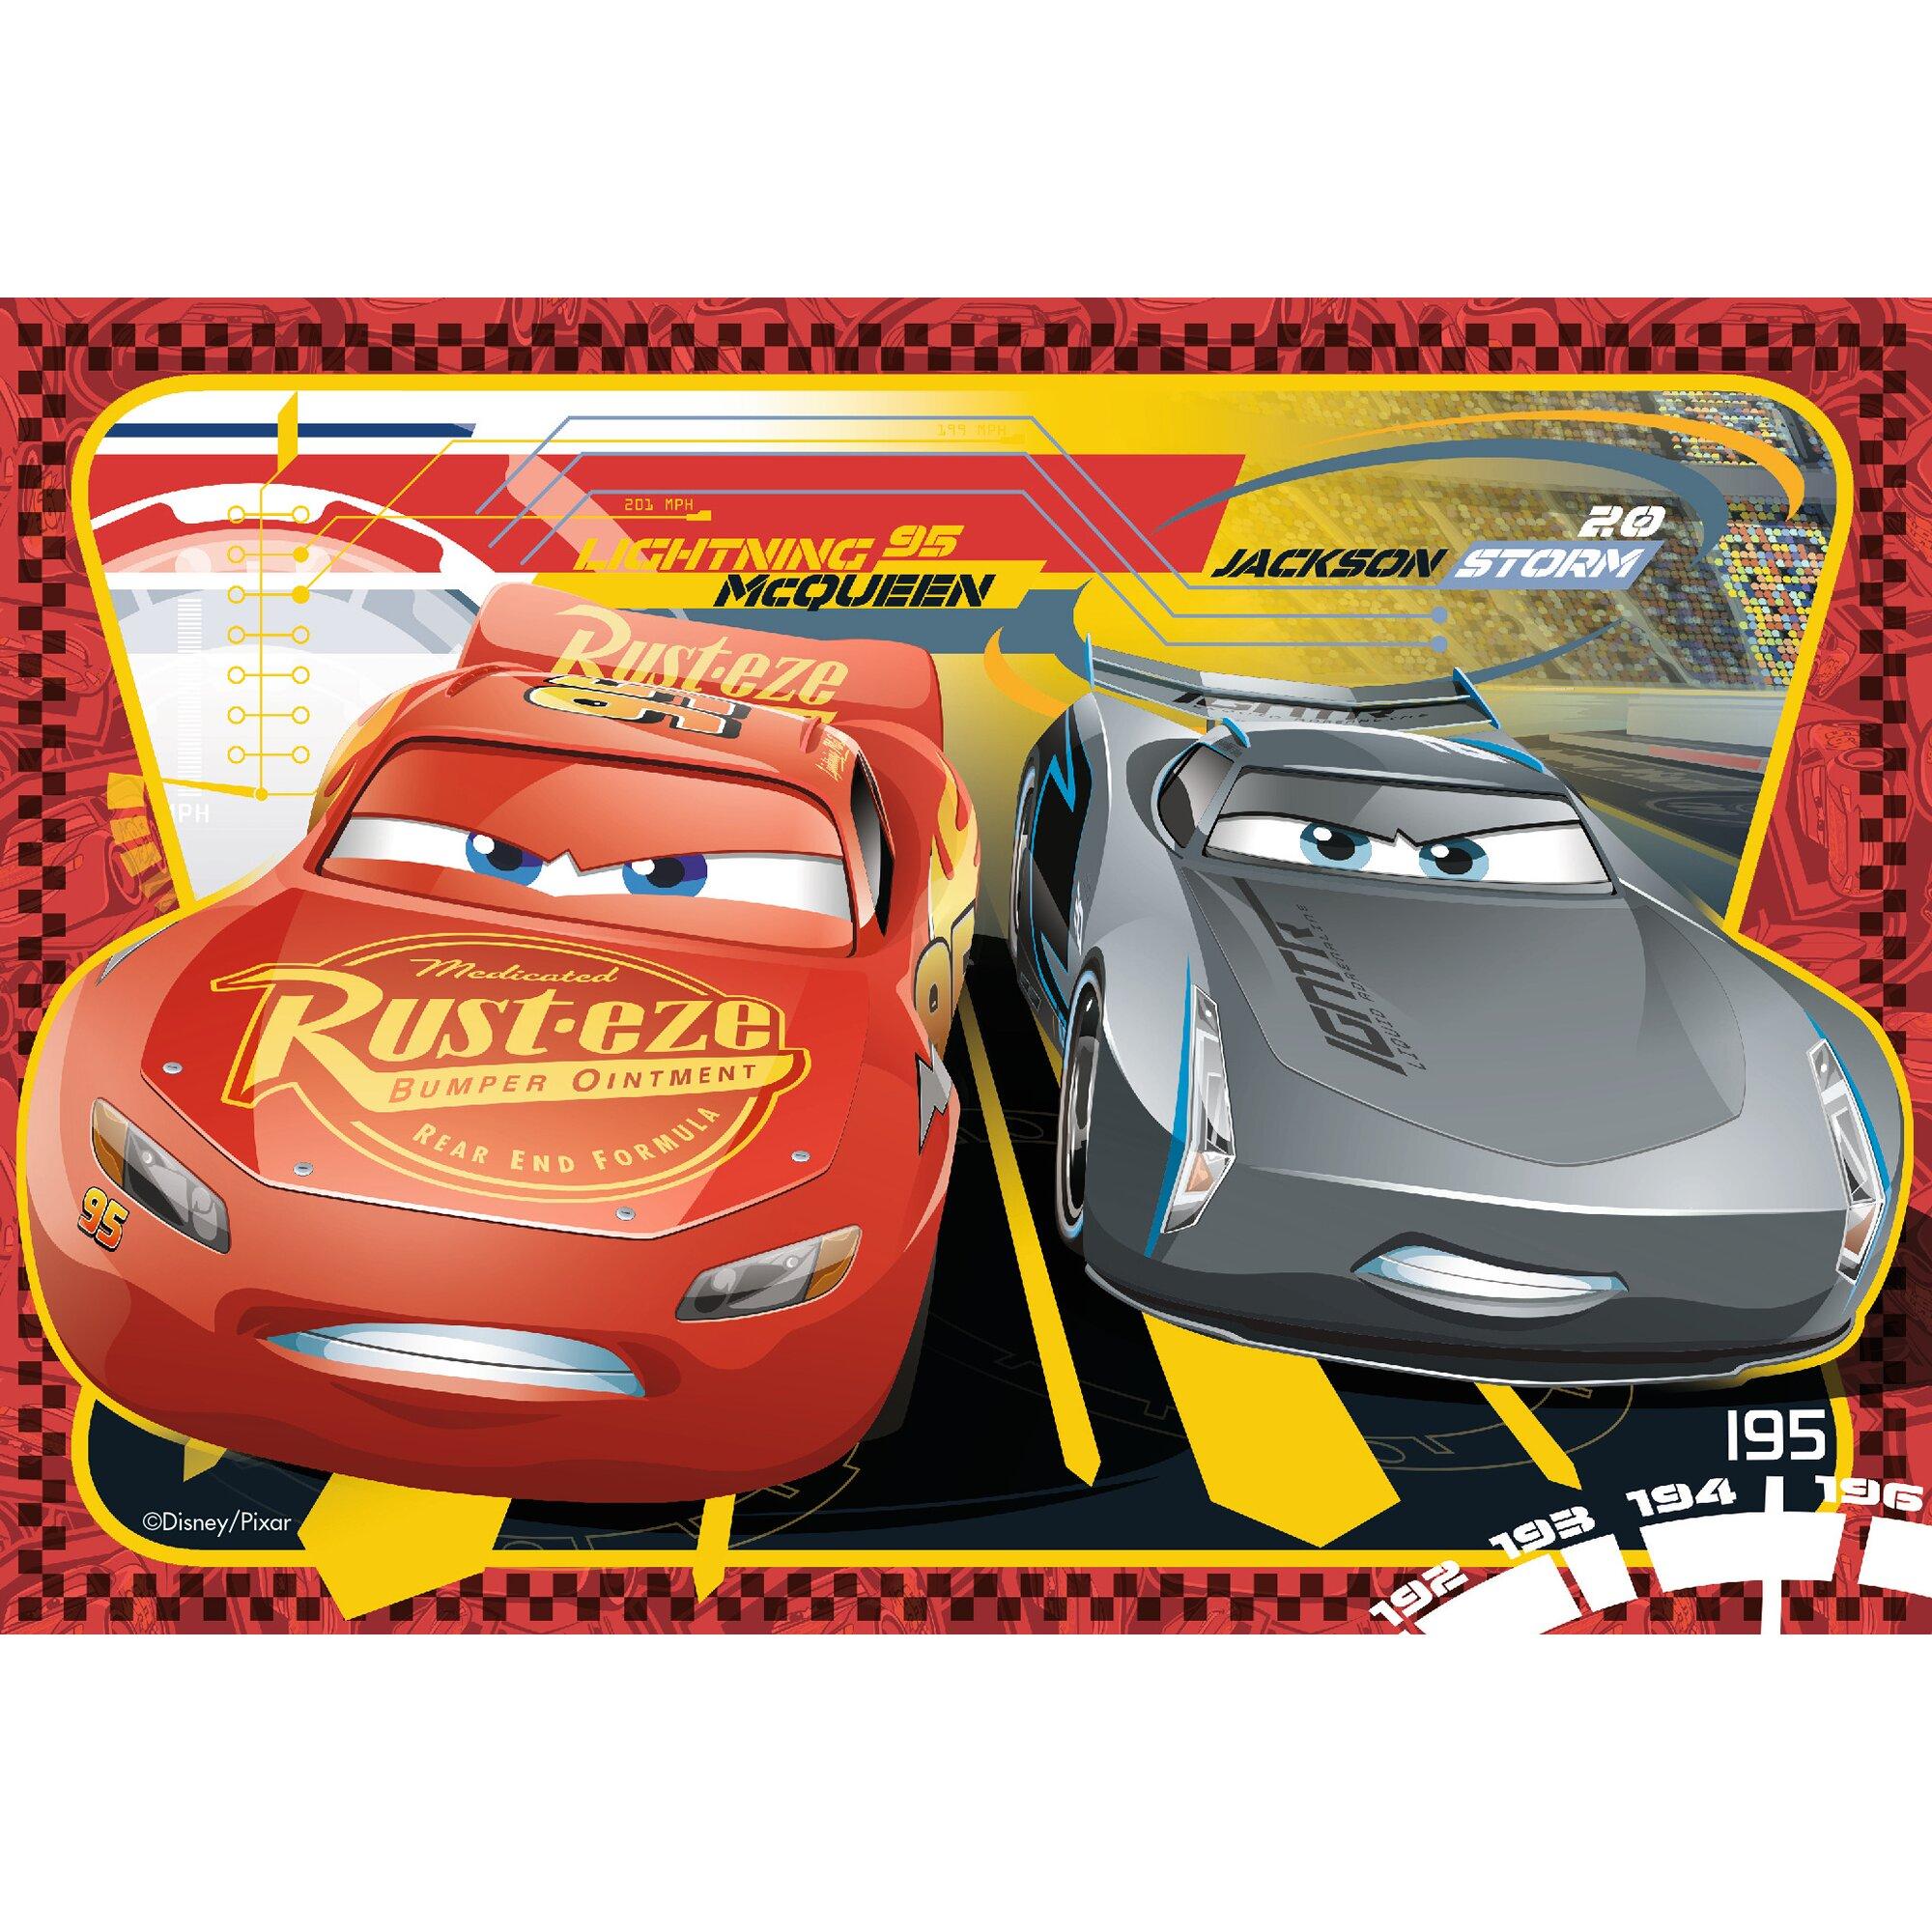 ravensburger-zwei-kinderpuzzles-inkl-mini-postern-24-teile-abenteuer-mit-lightning-mcqueen